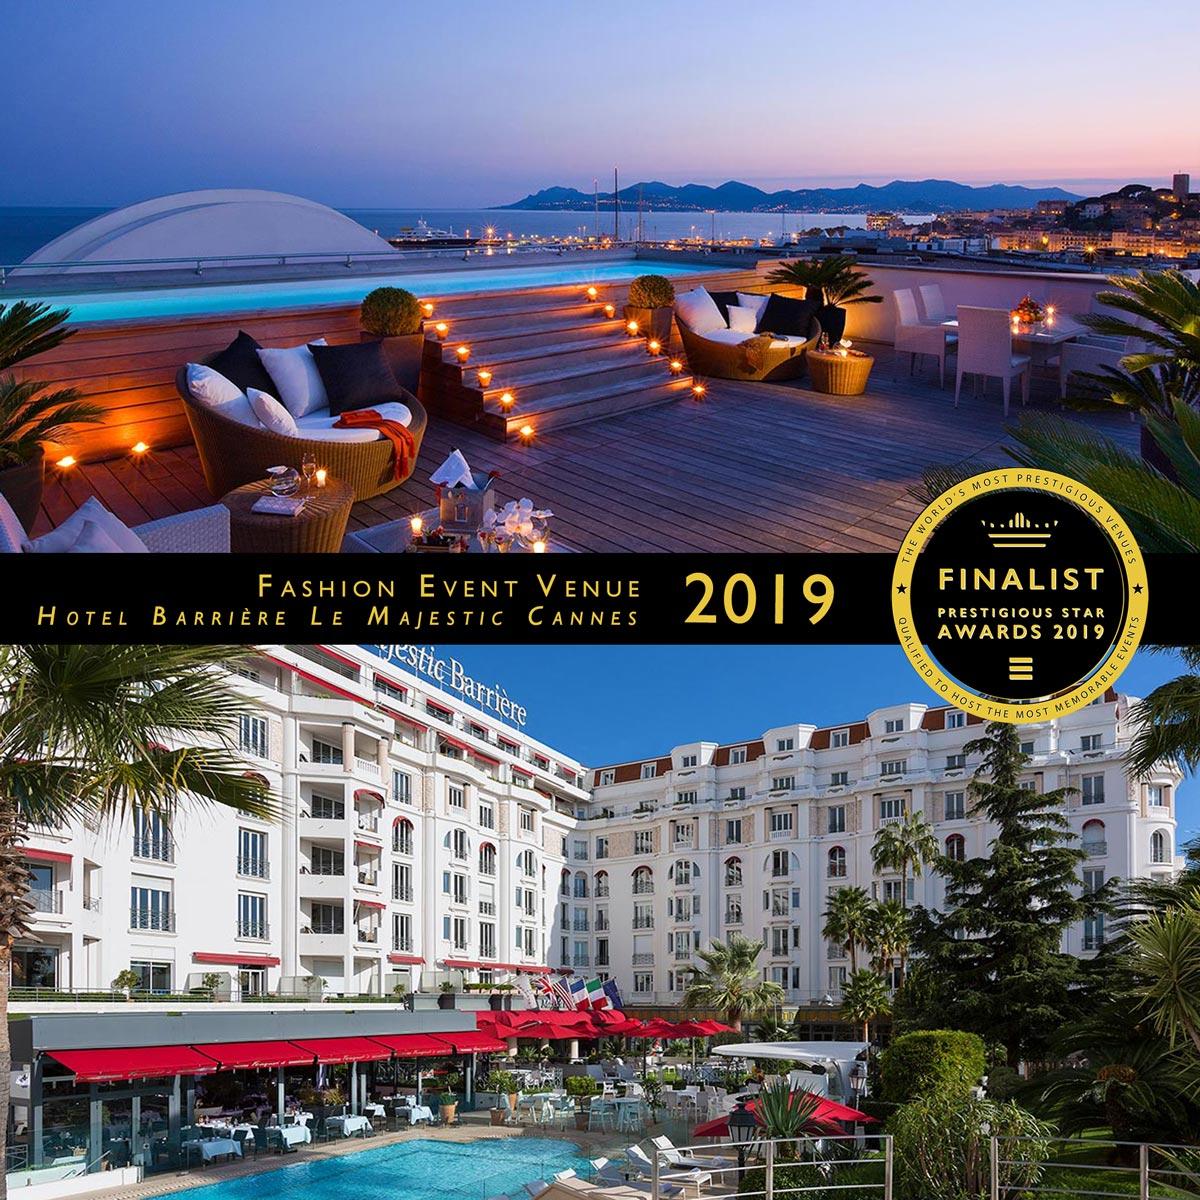 Majestic Suite at Hotel Barrière Le Majestic Cannes